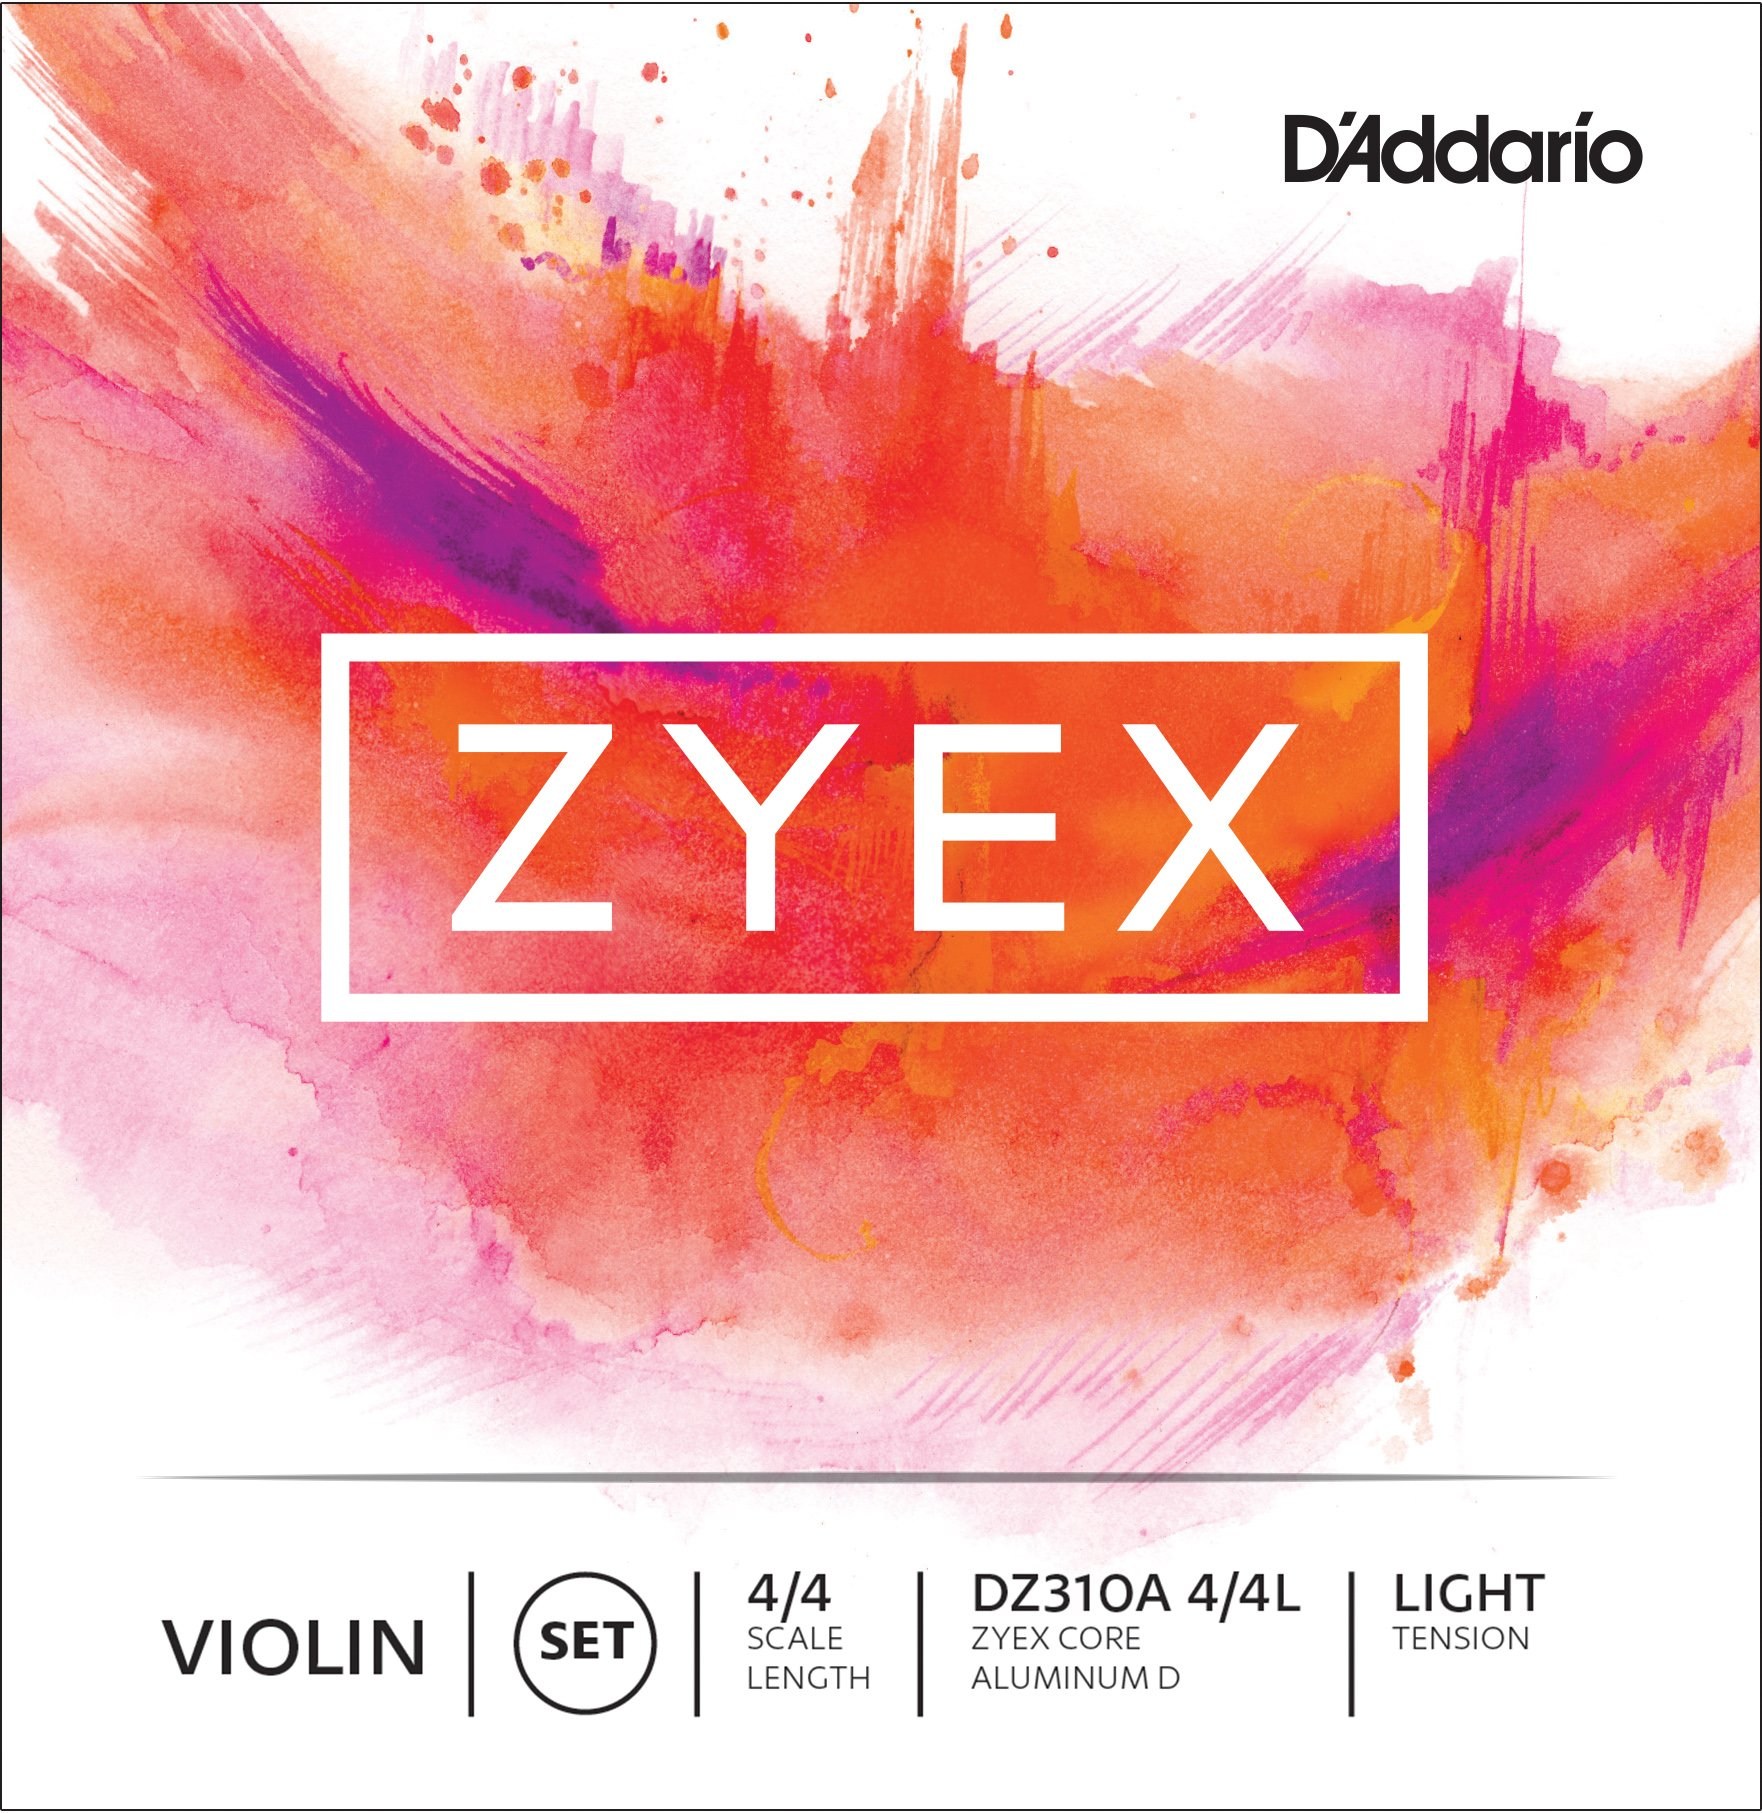 D'Addario Zyex Violin String Set with Aluminum D, 4/4 Scale, Light Tension